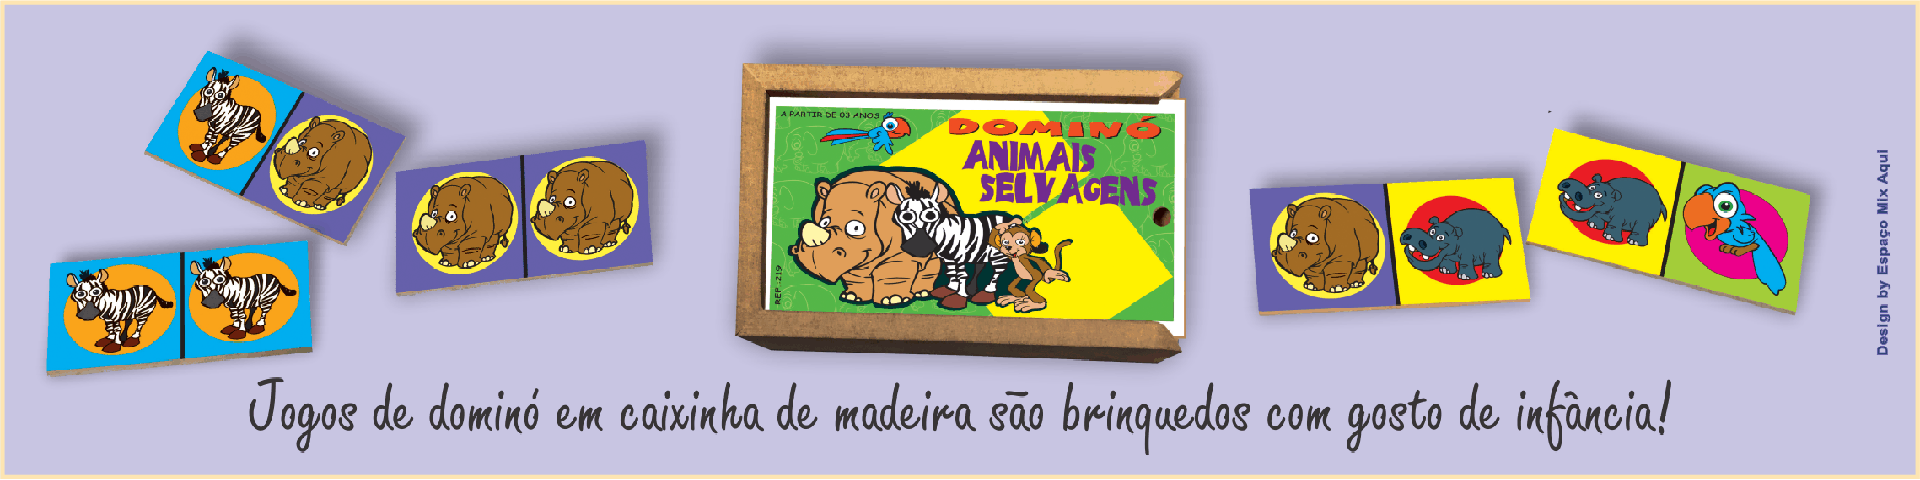 Banner Dominós